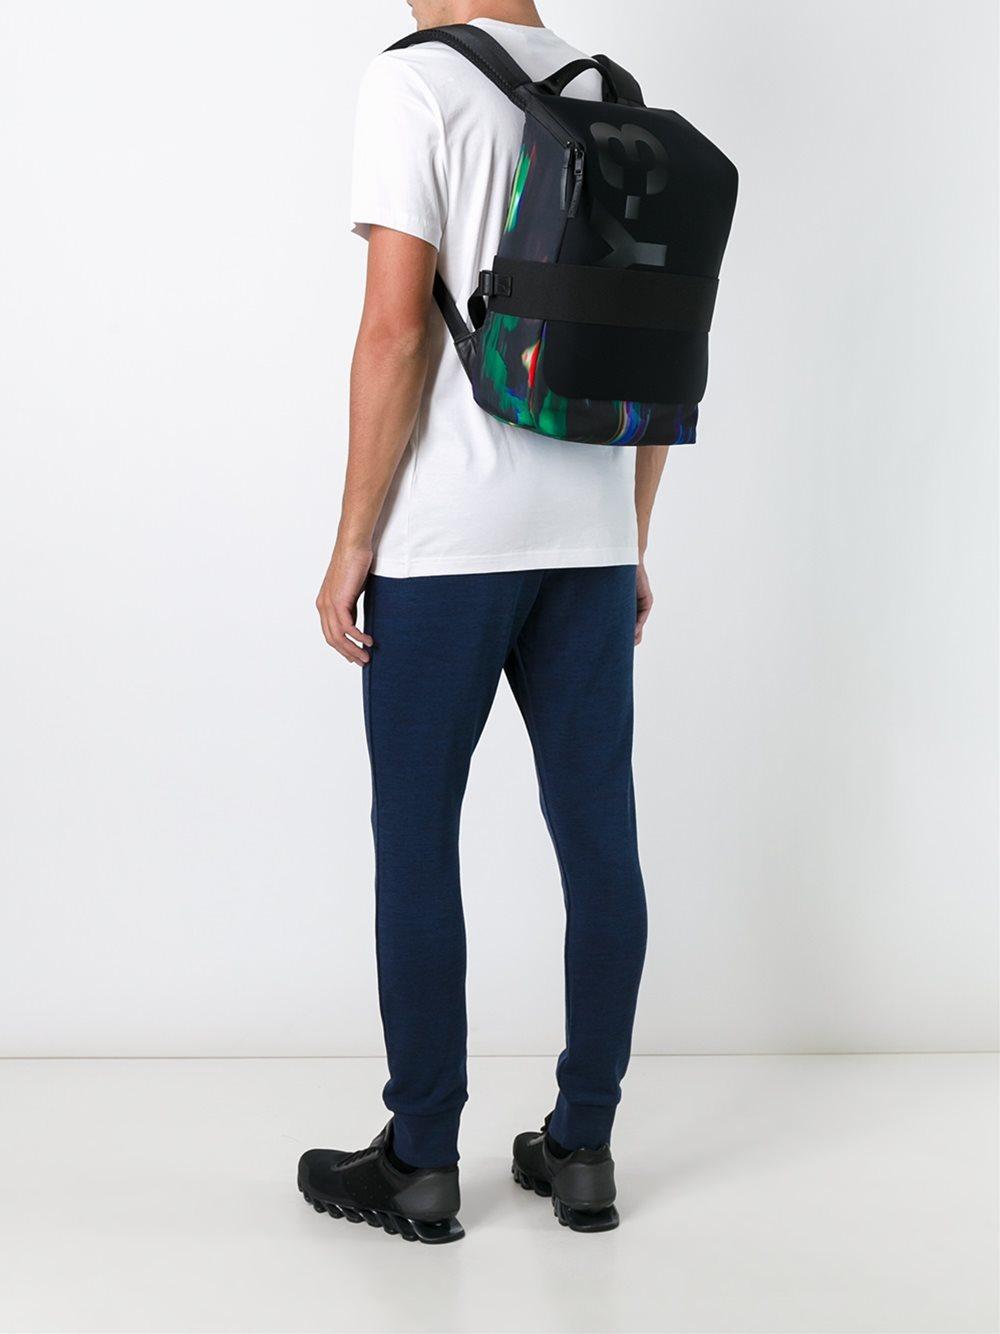 61bcd95dad4b6 Y-3 Small  qasa  Backpack in Black for Men - Lyst